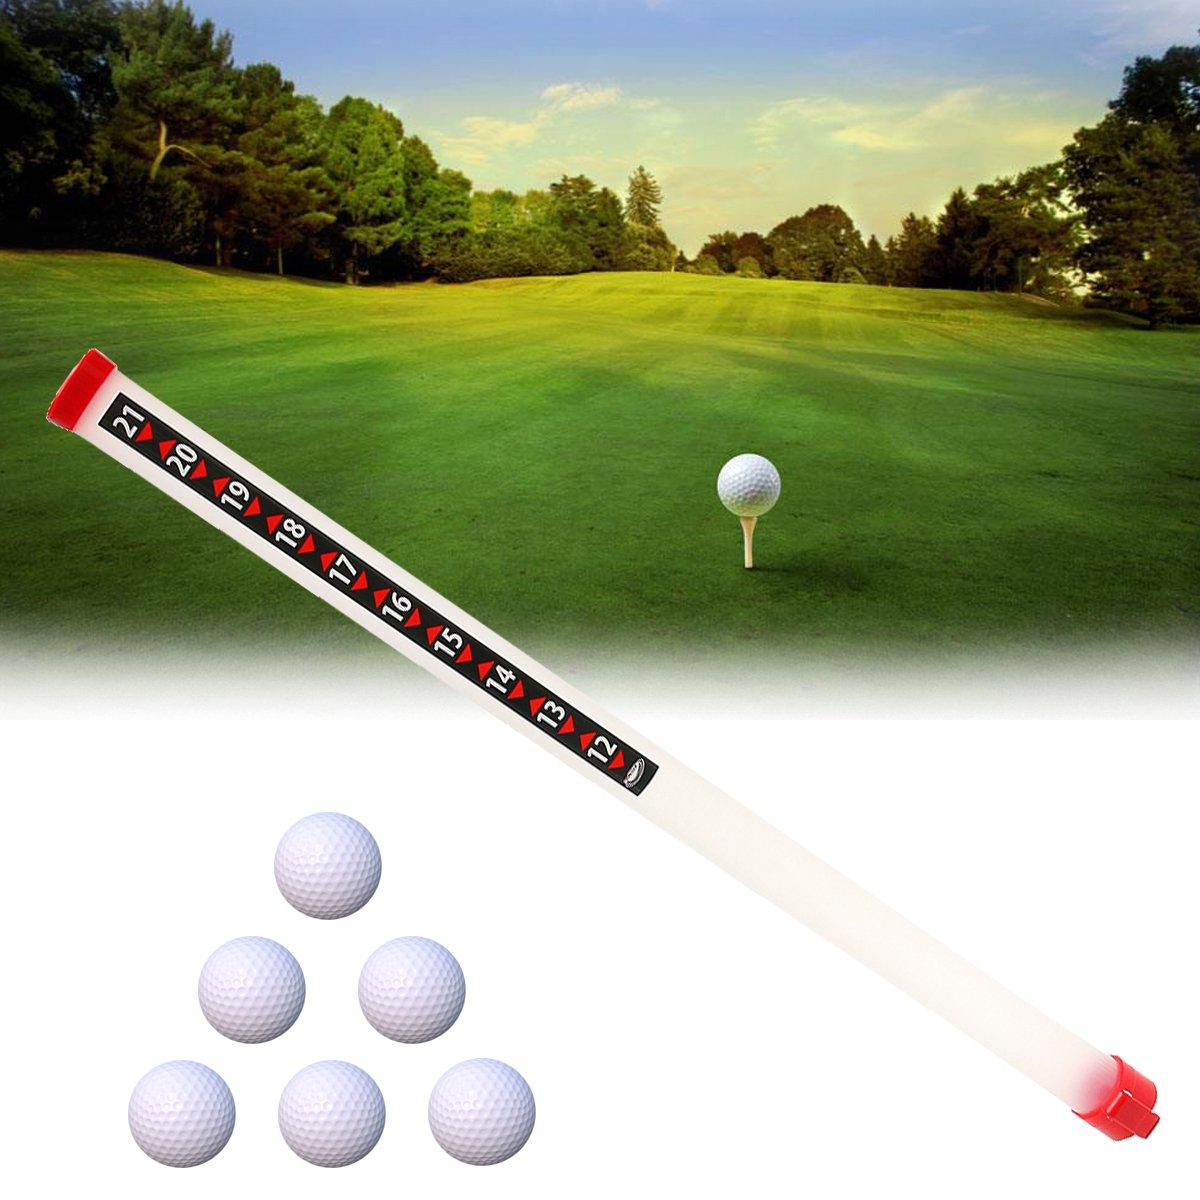 Portable Outdoor Golf Ball Picker Sport Practice Shagger Pick-Ups Tube Retriever